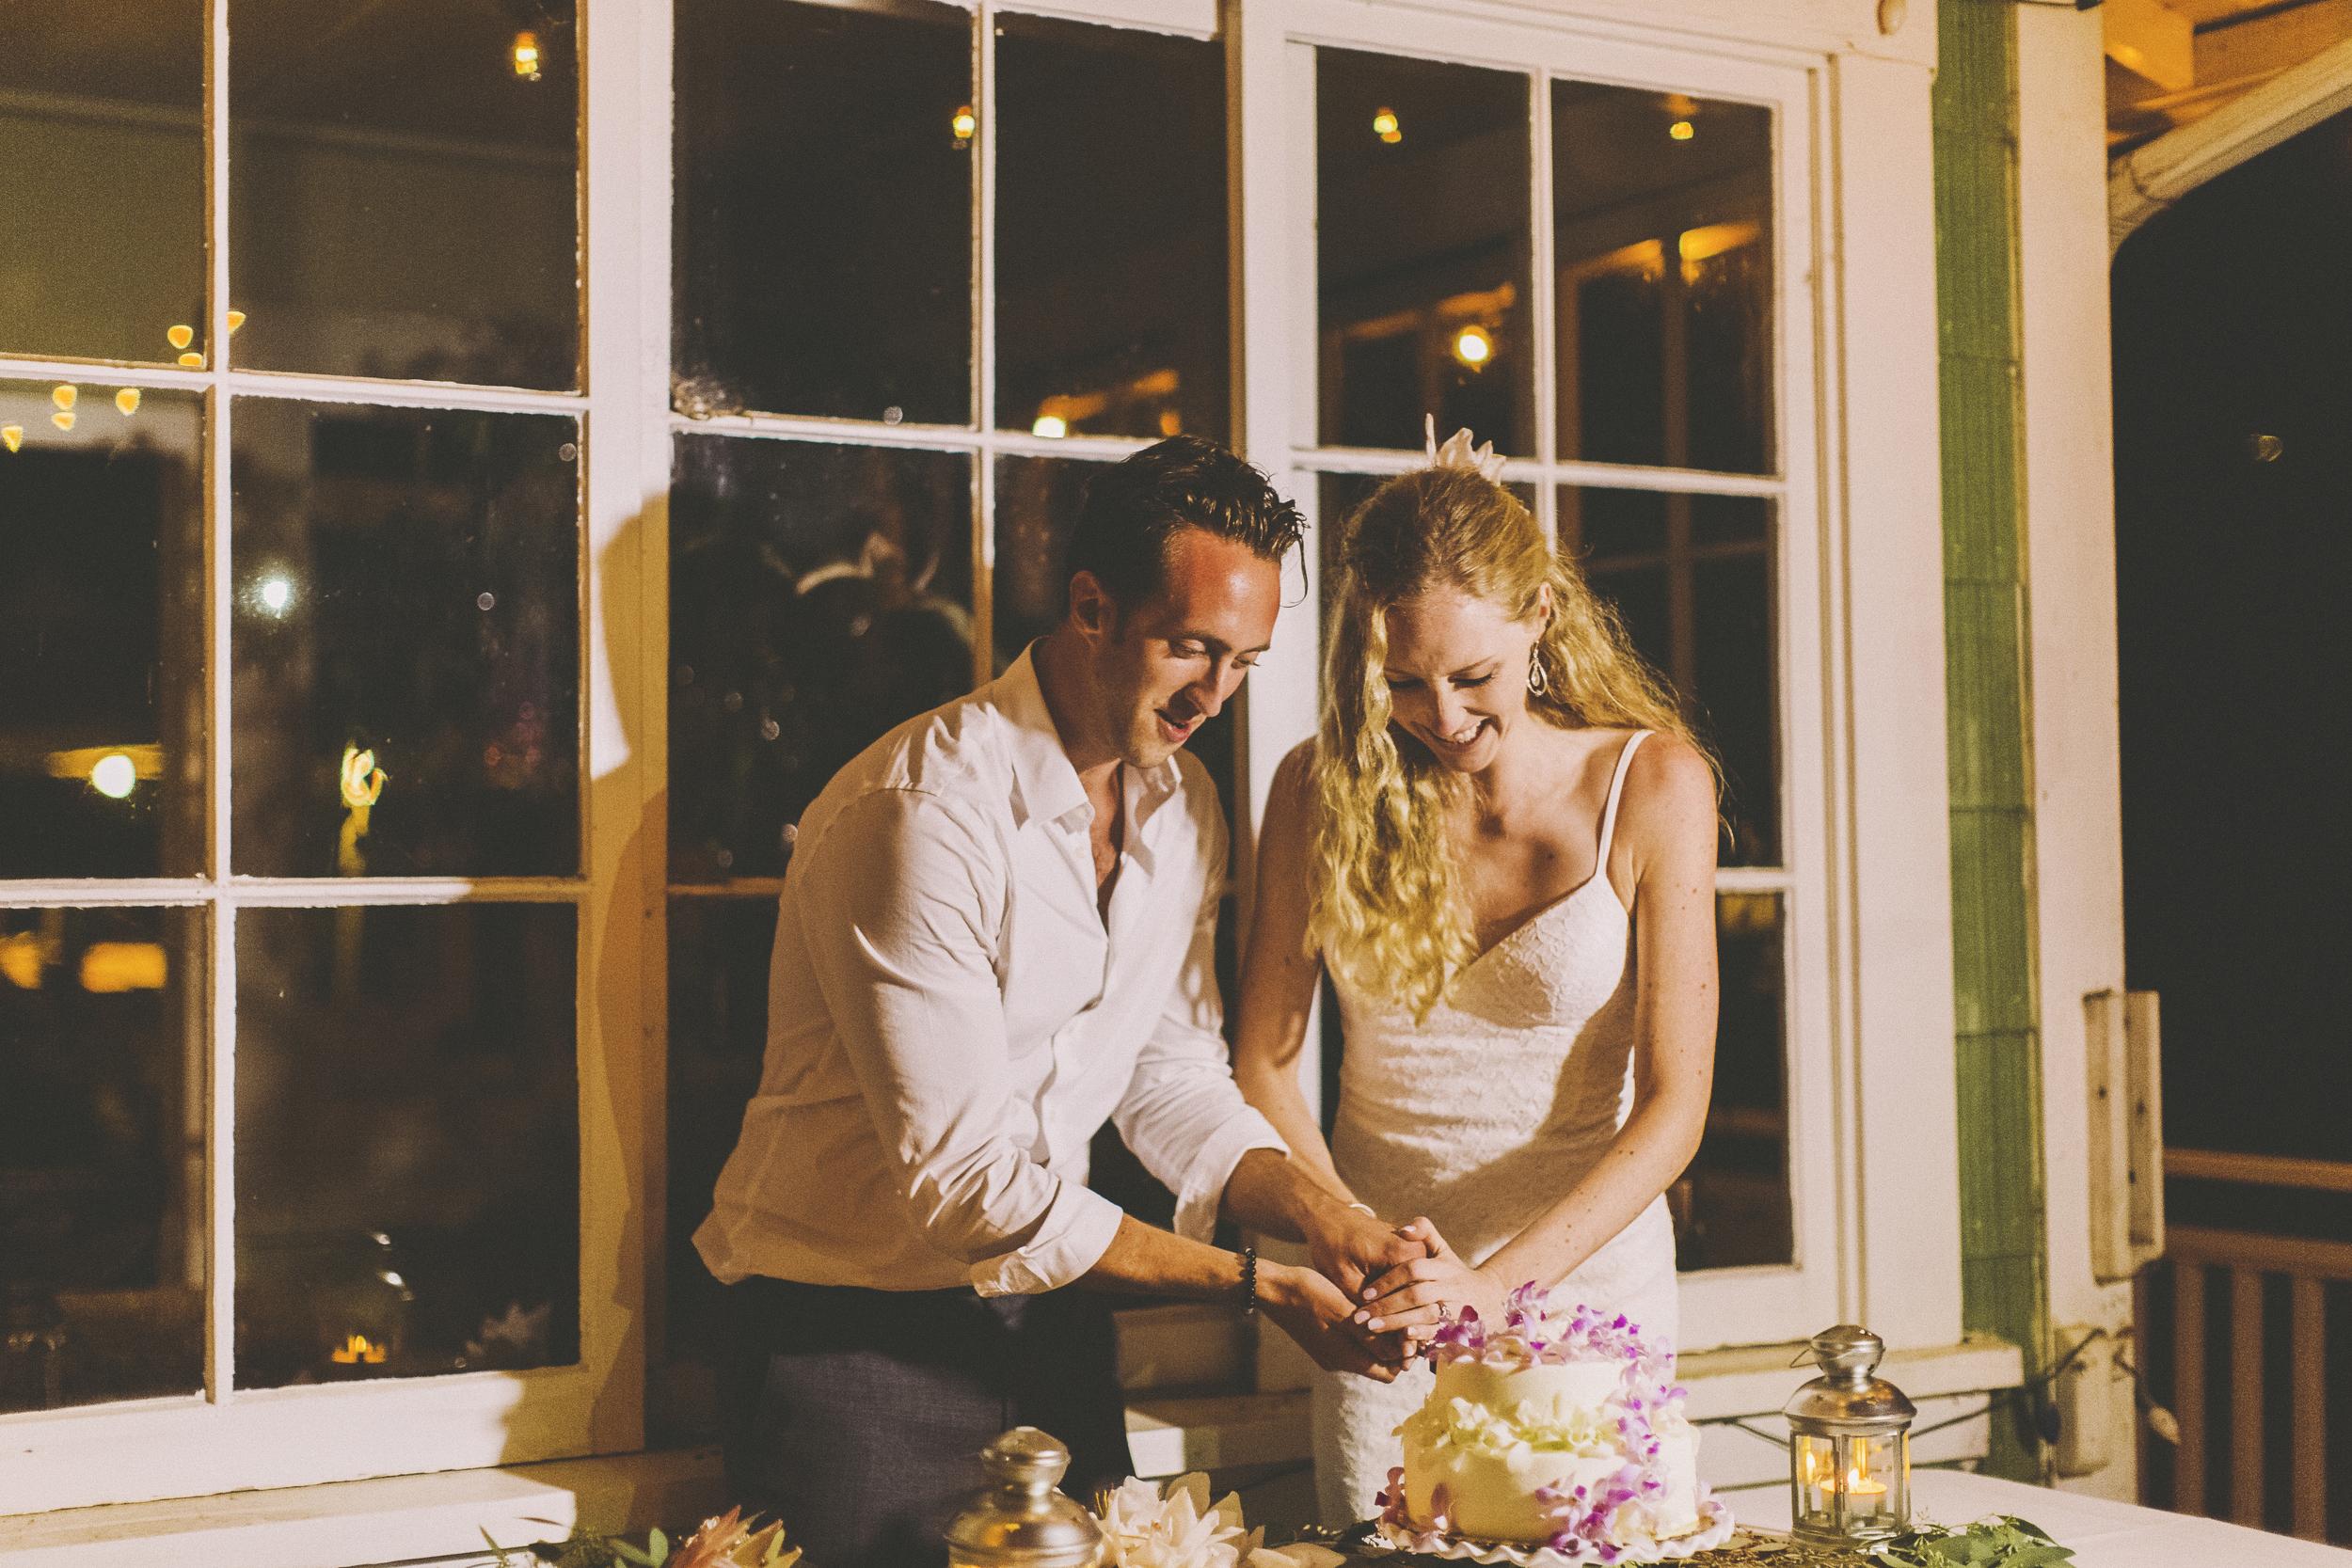 angie-diaz-photography-maui-wedding-124.jpg